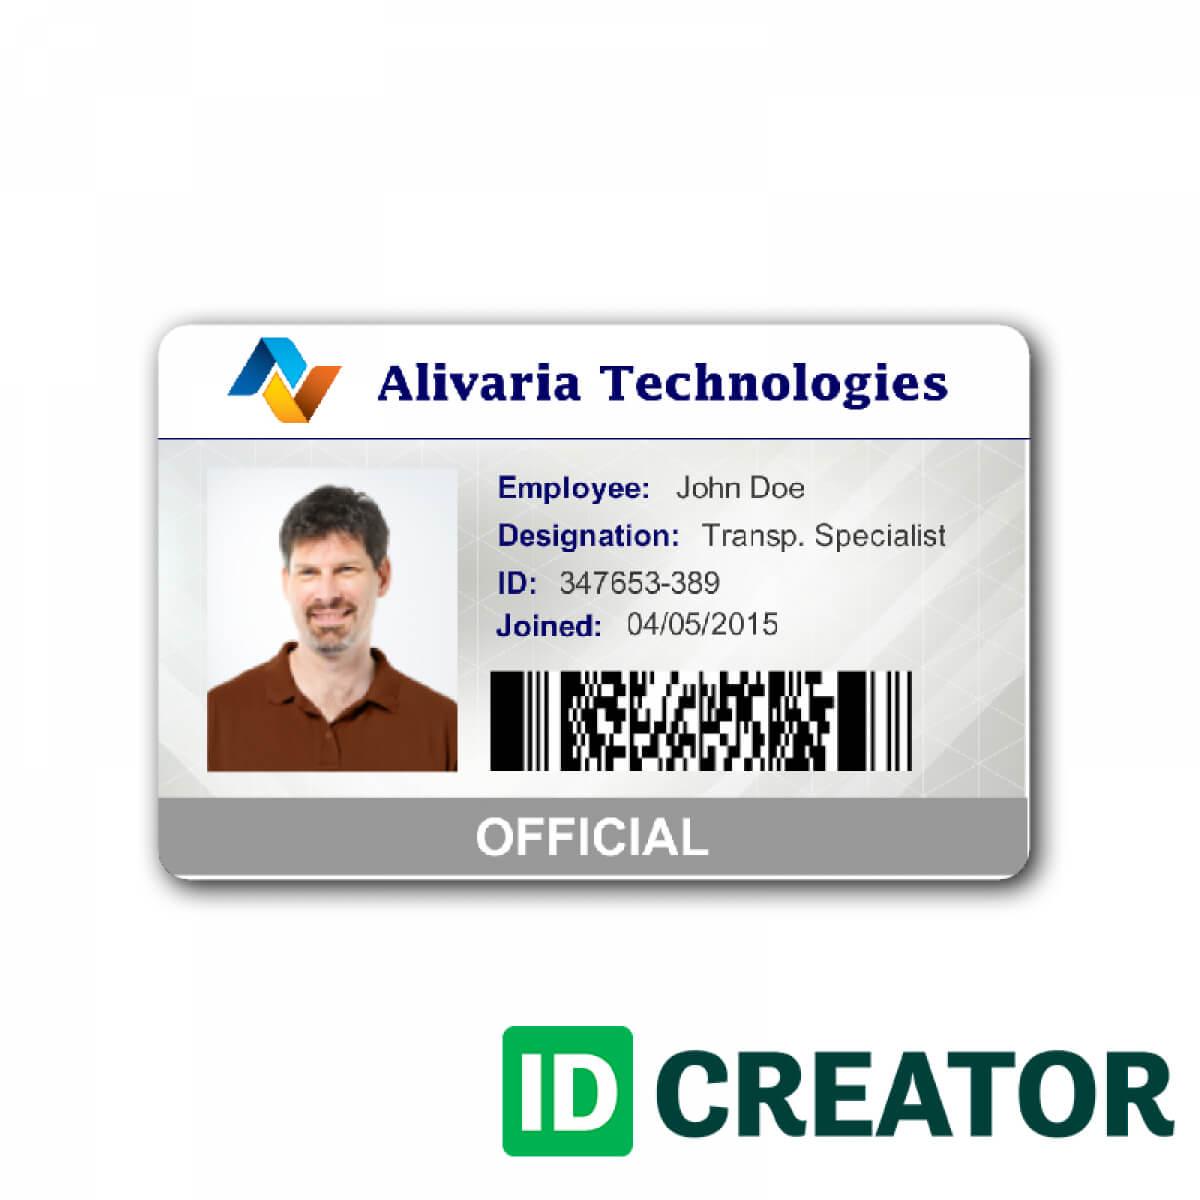 Employee Id Card Template Microsoft Word Free Download pertaining to Id Card Template Word Free